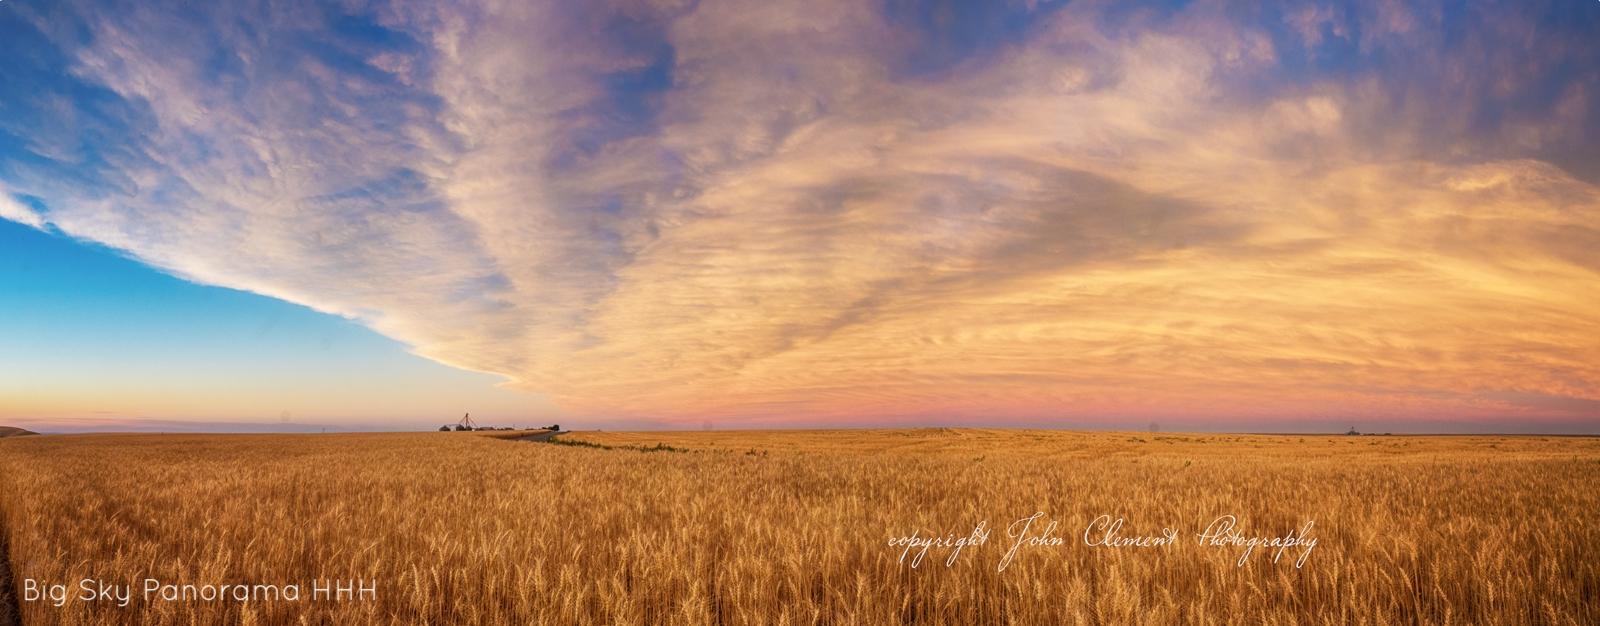 Big HHH Panorama_HDR.jpg